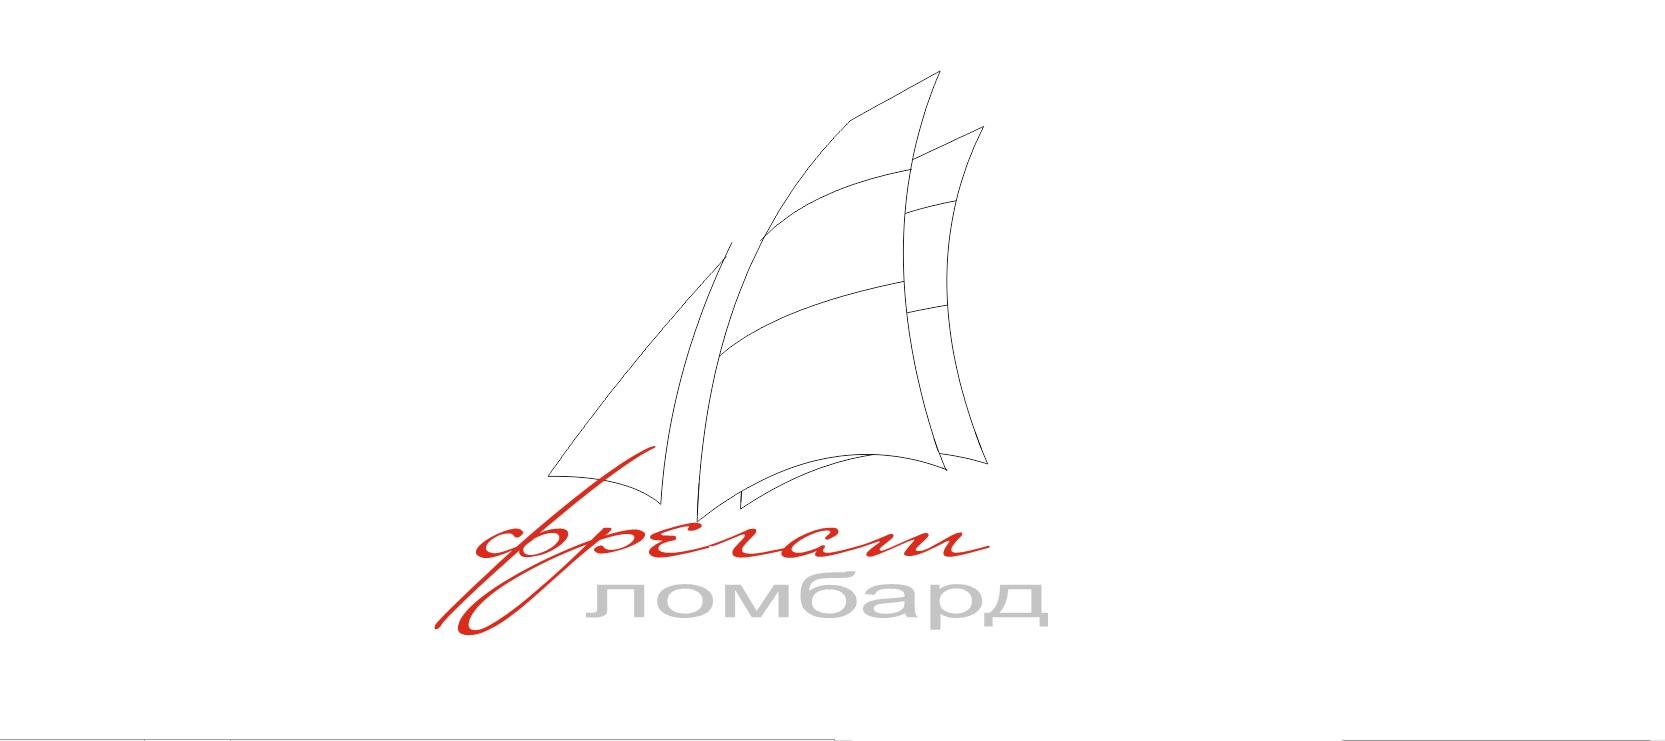 "Логотип, фирменный стиль Ломбард ""Фрегат"" фото f_4885bc2f4bc9ea62.jpg"